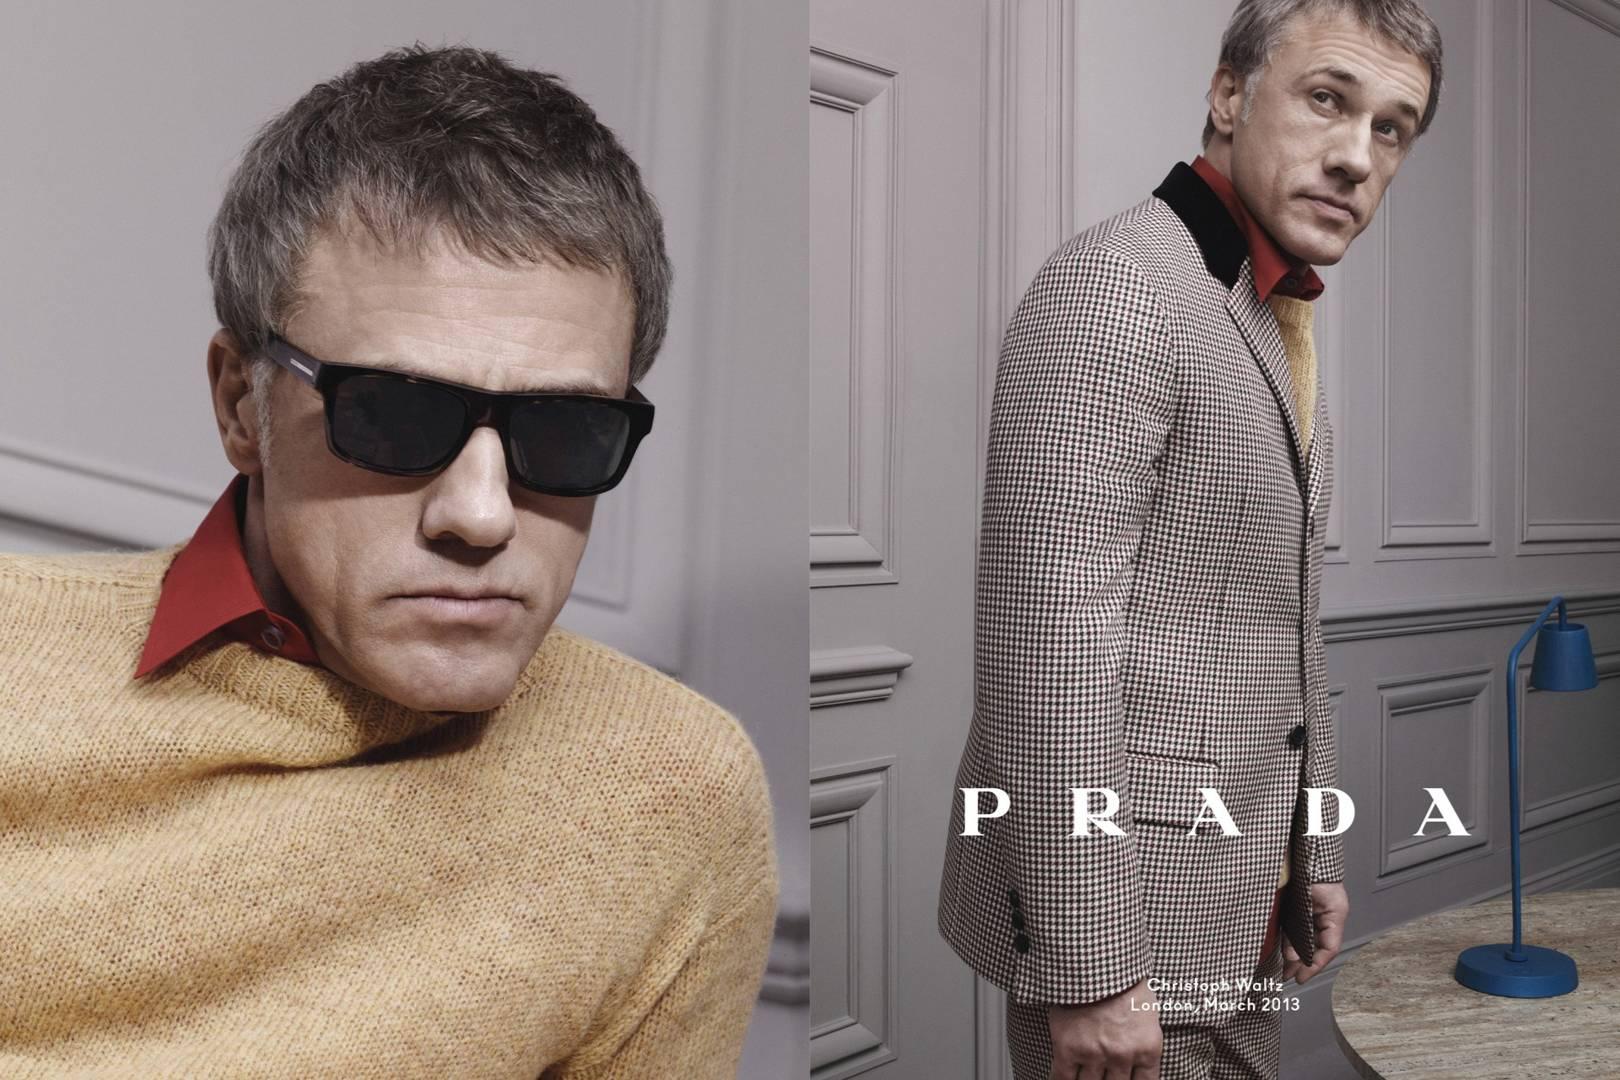 Prada AutumnWinter 2013 Campaign pics